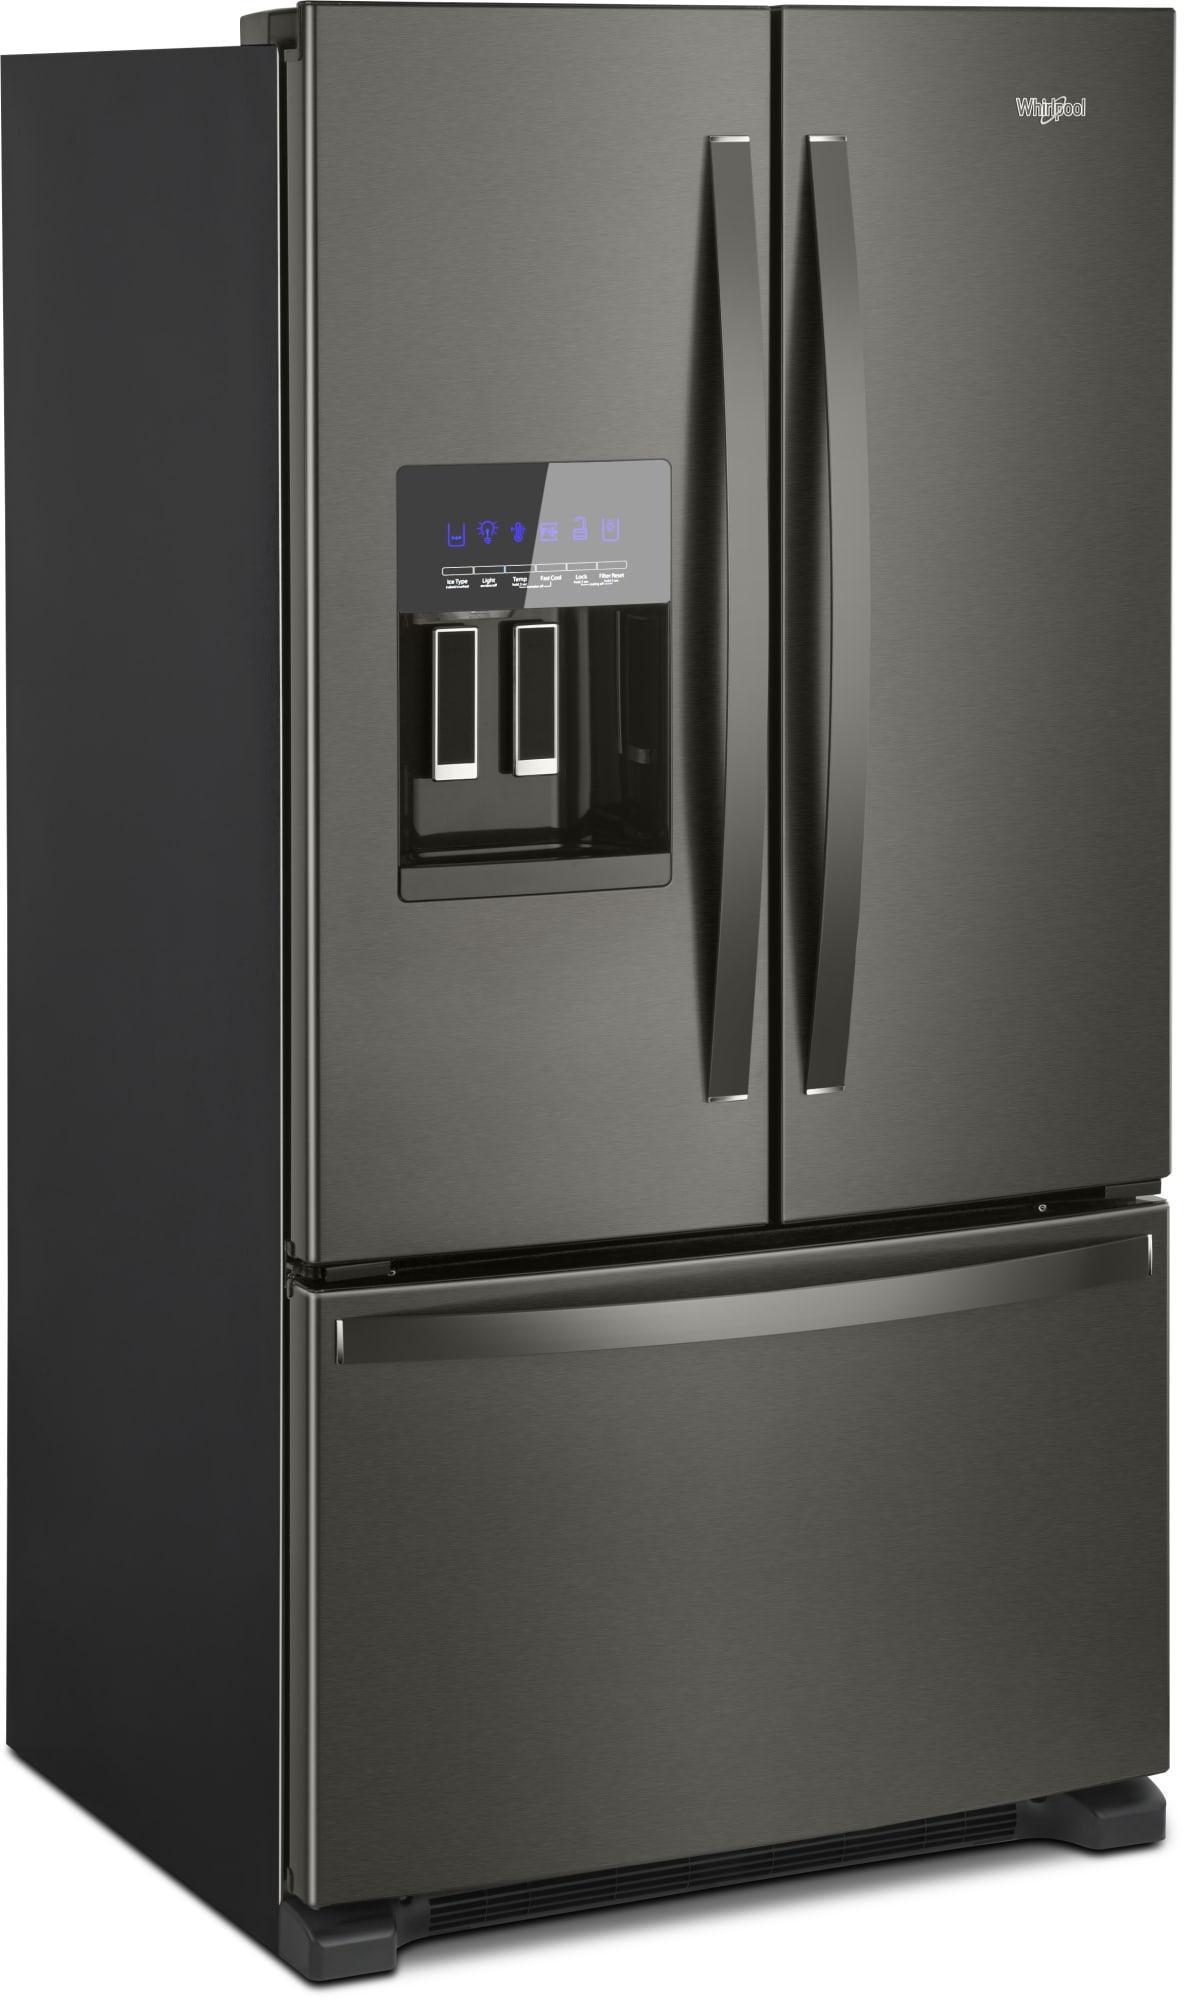 Wrf555sdfz Whirlpool Wrf555sdfz French Door Refrigerators